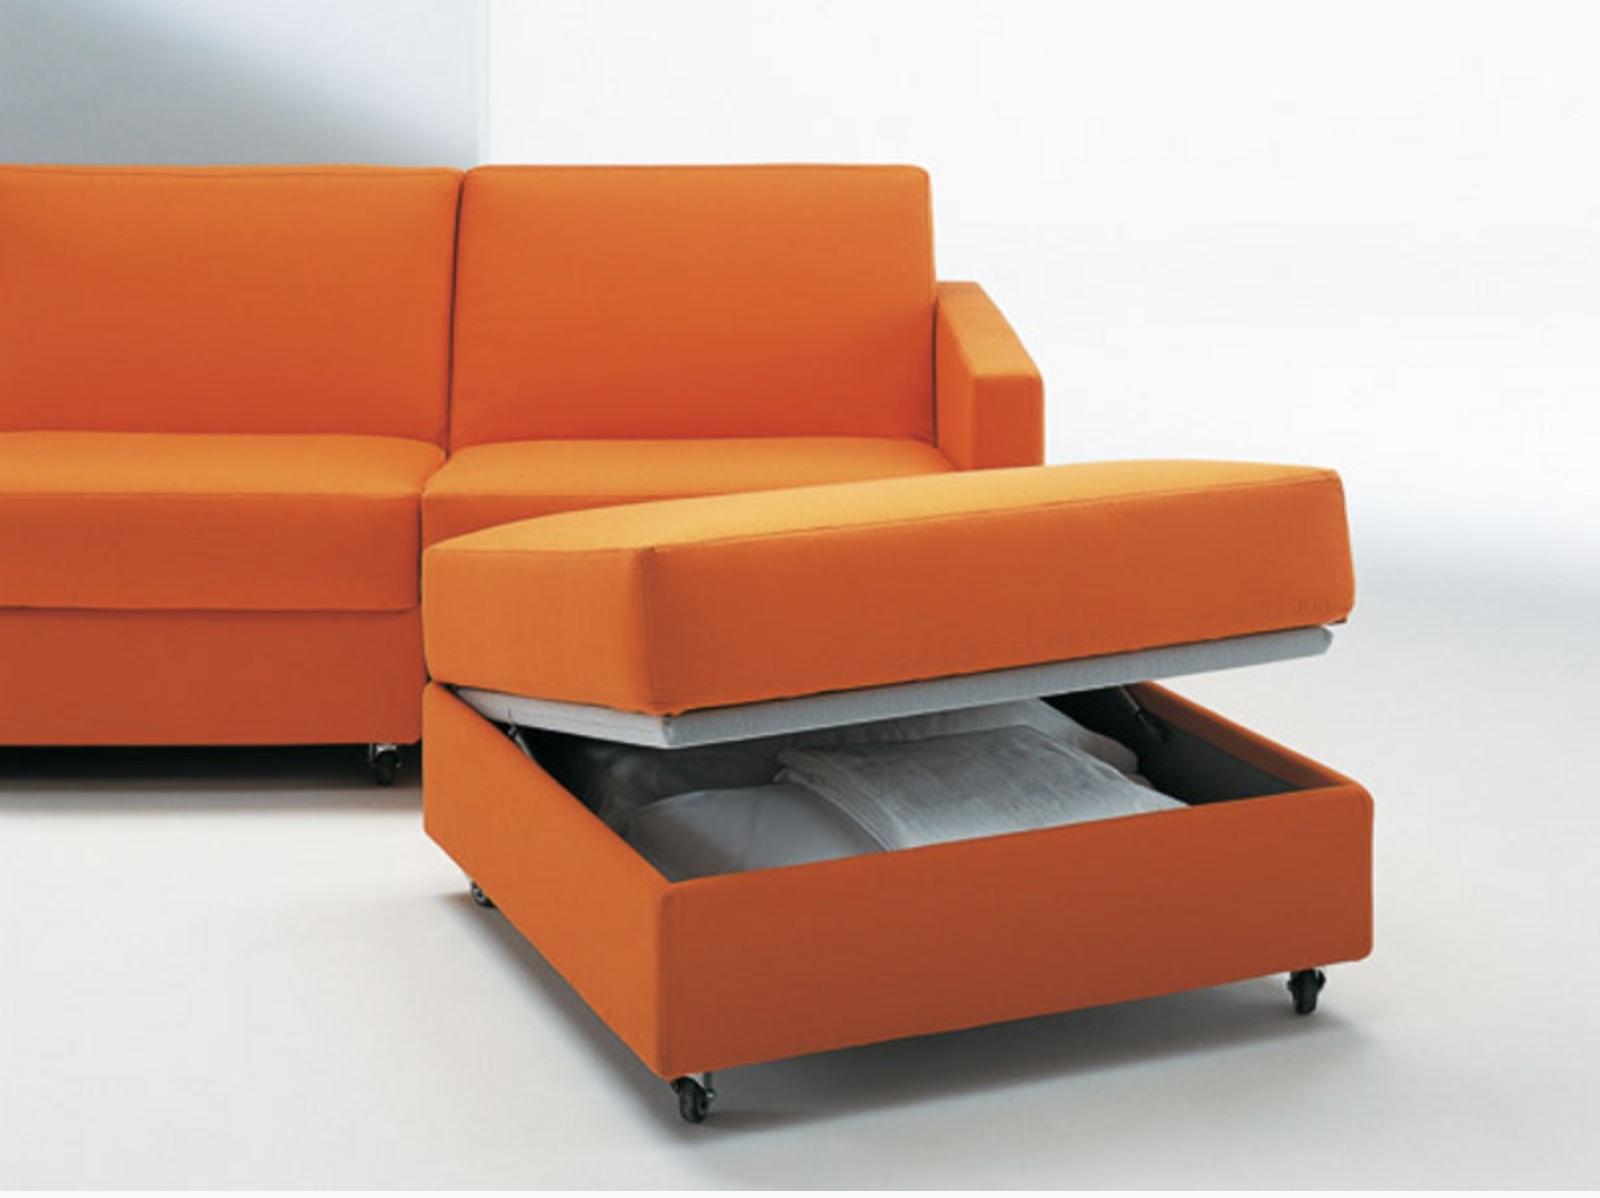 SBD 102 Modern Sofa Beds